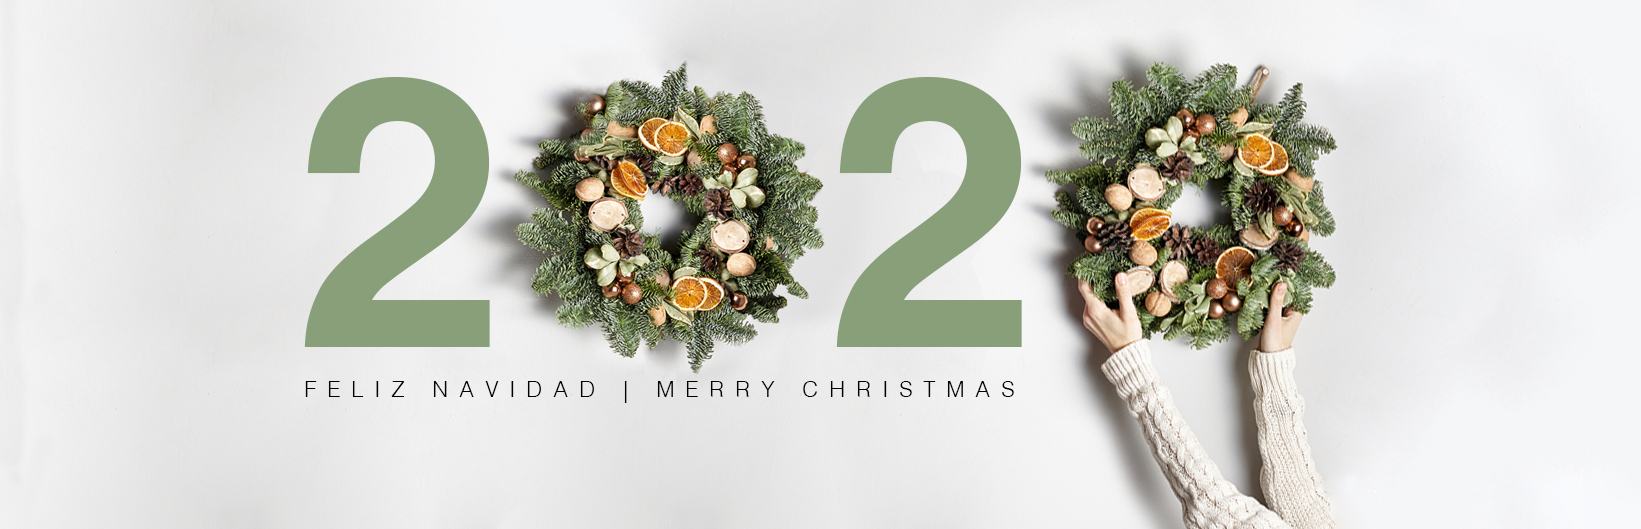 Proinca te desea feliz Navidad 2020